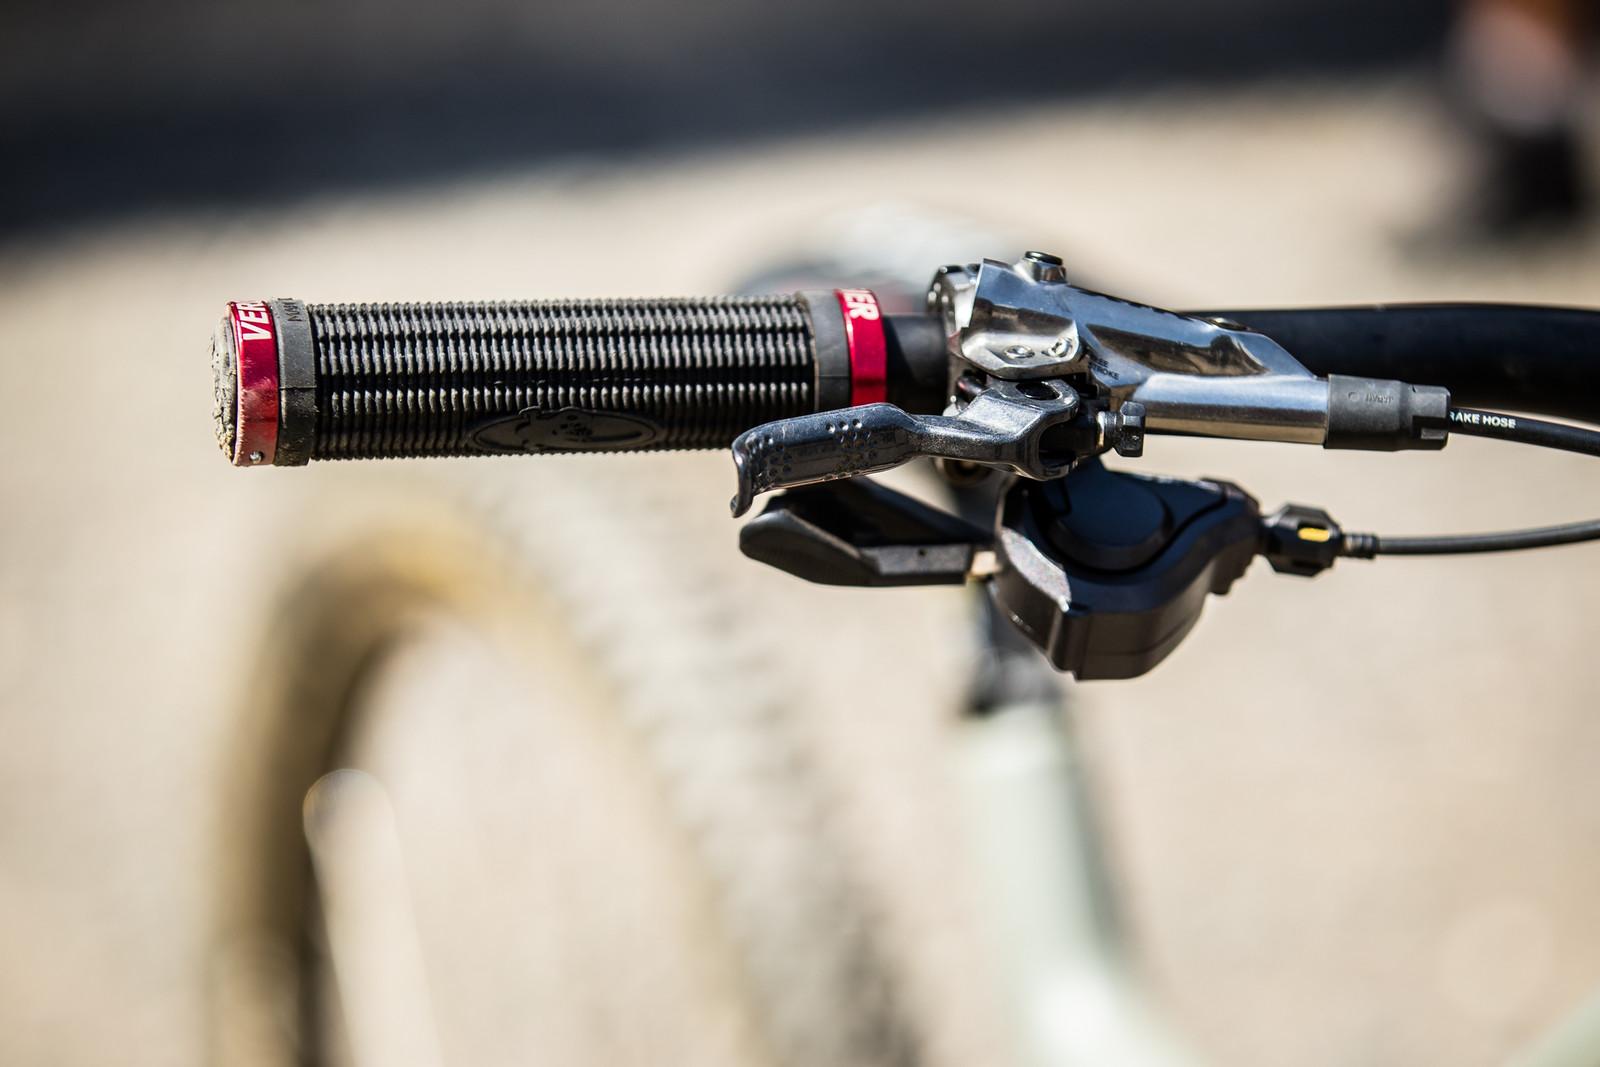 Lizard Skins Grips - WINNING BIKE - Loris Vergier's Santa Cruz V10cc 29 - Mountain Biking Pictures - Vital MTB